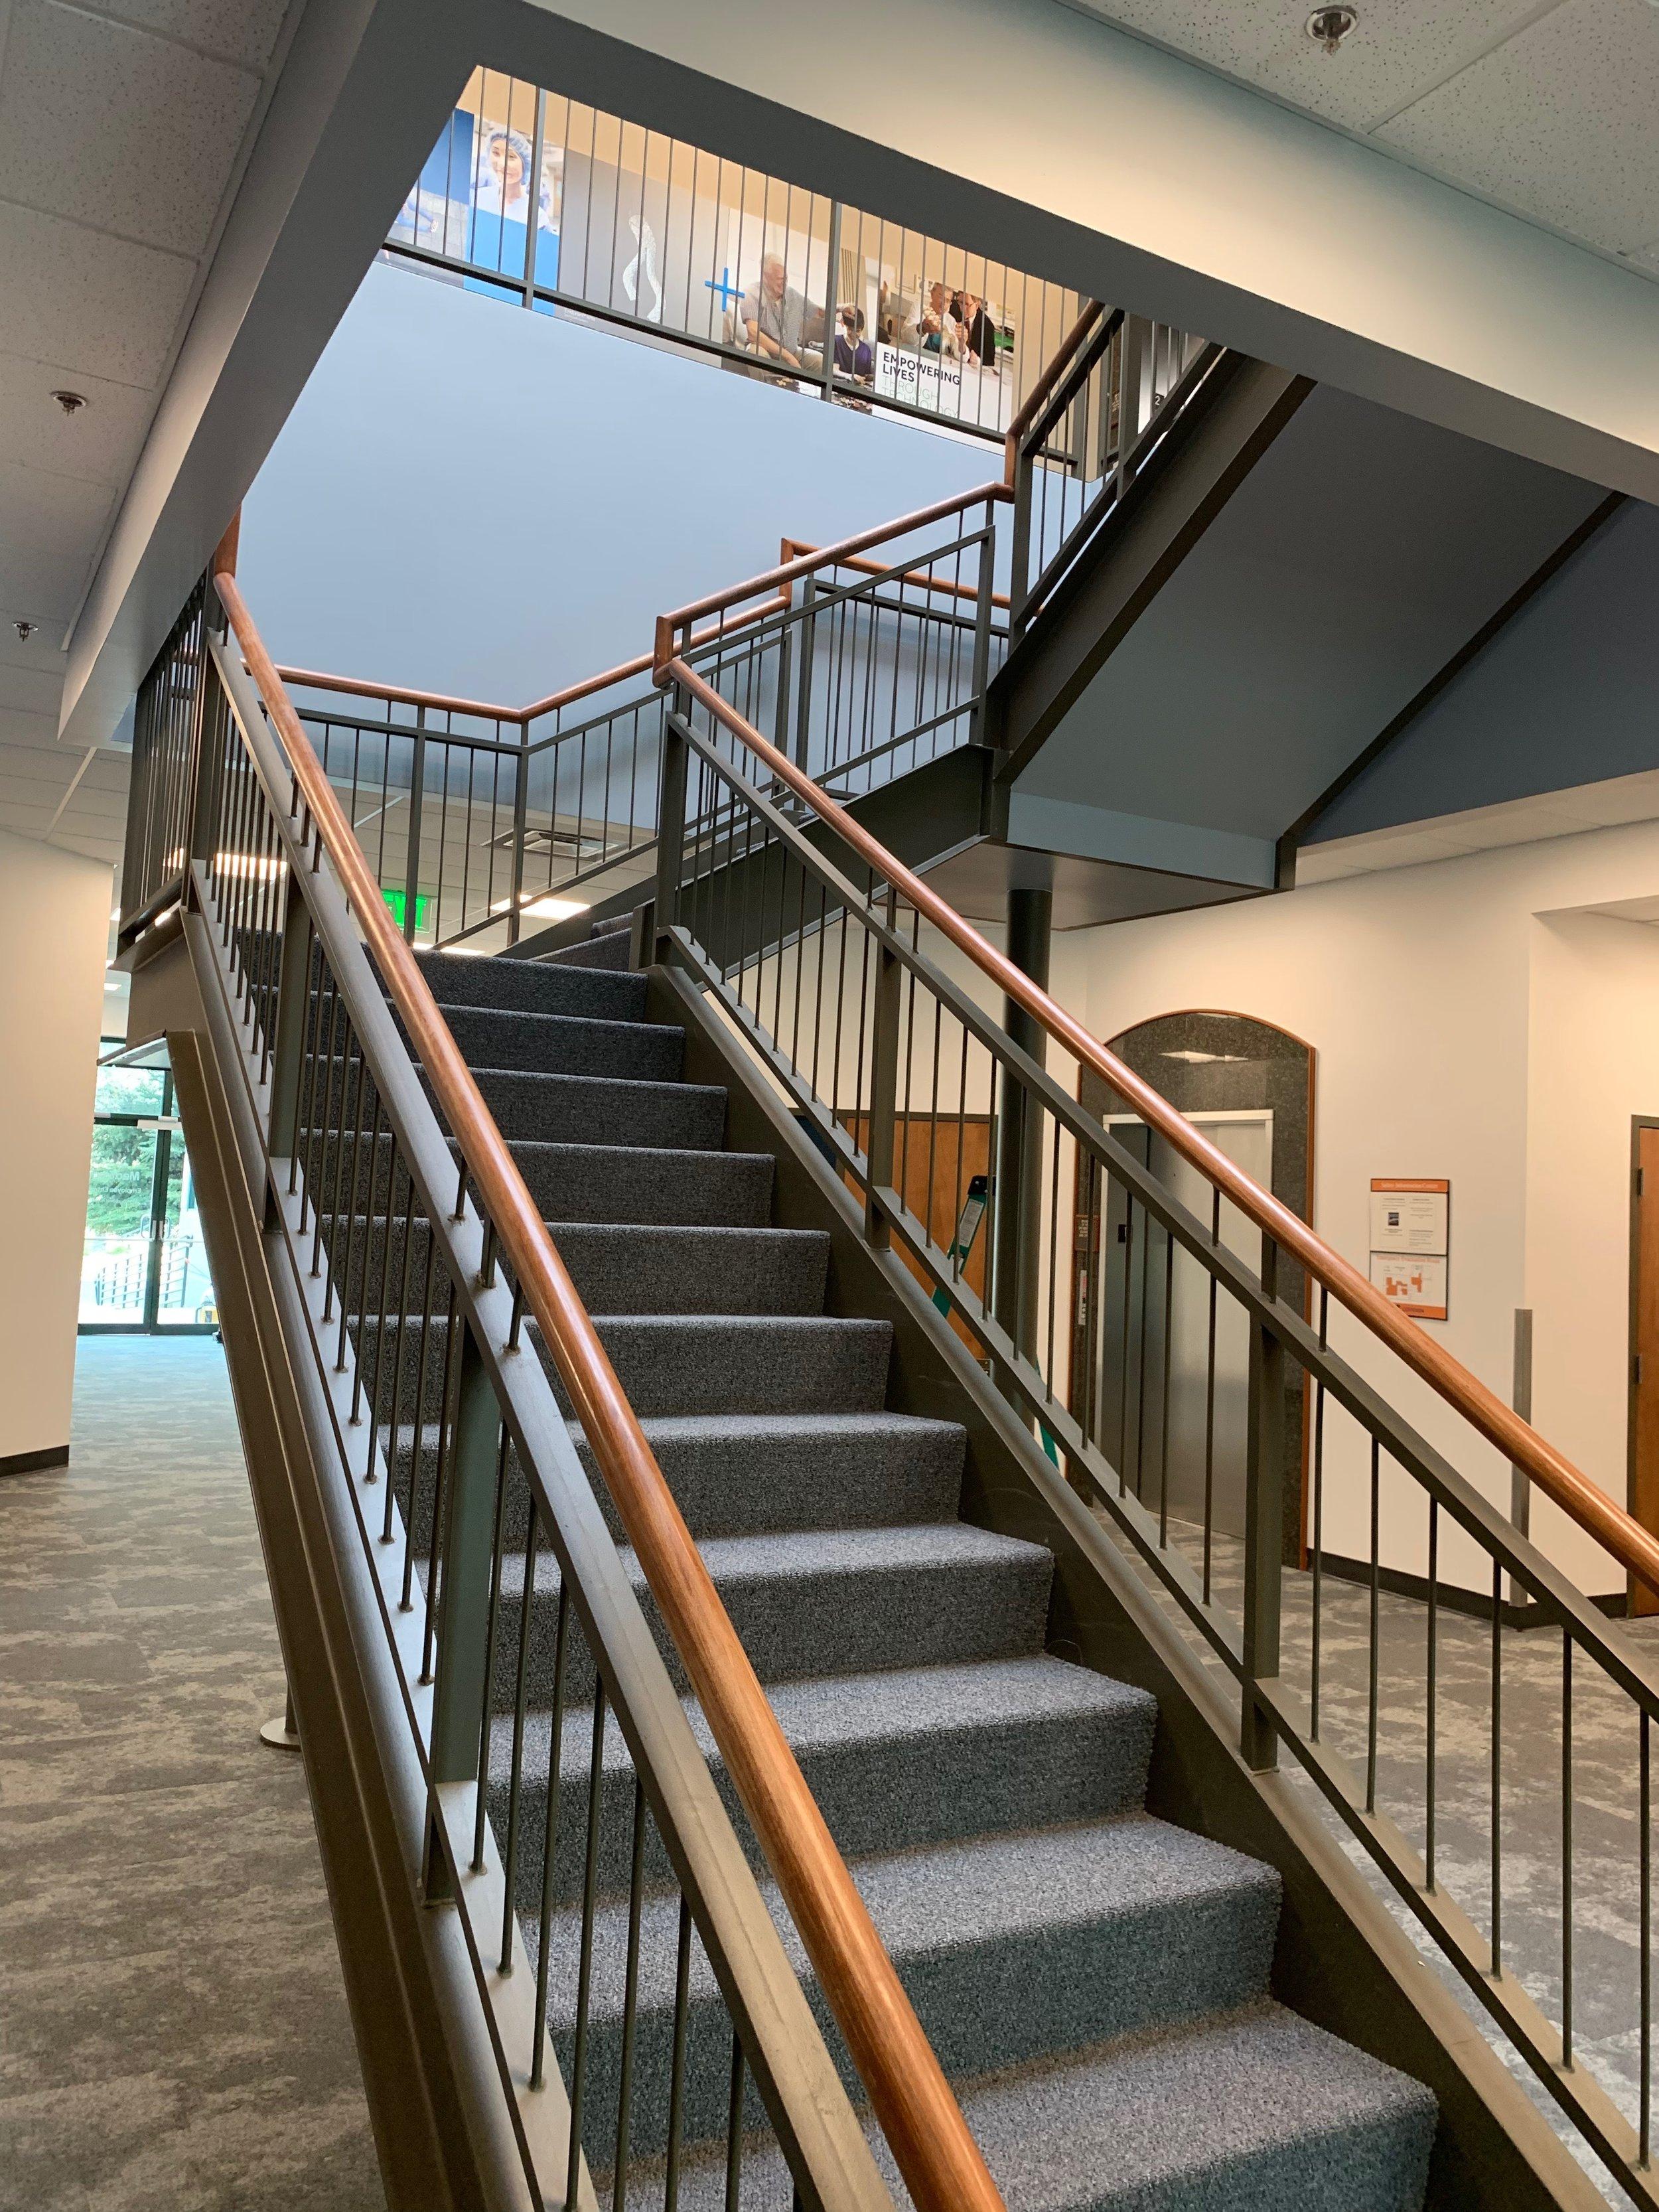 medtronic building threecore stairwell 4-27-19 #5.JPG